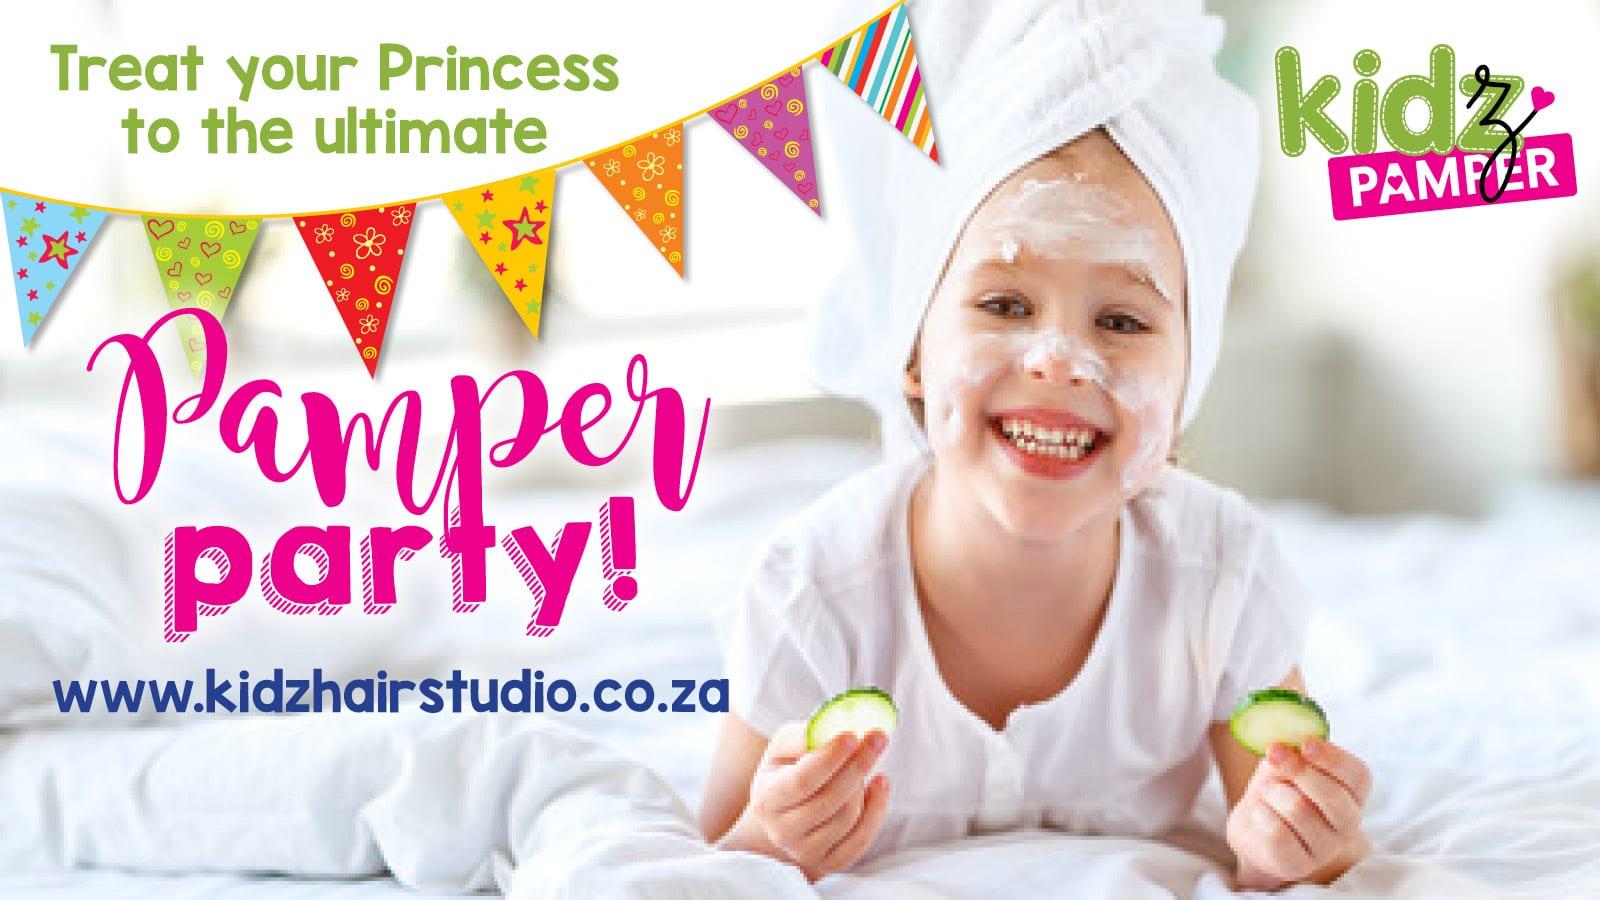 Kids Hair Studio pamper party advertisement